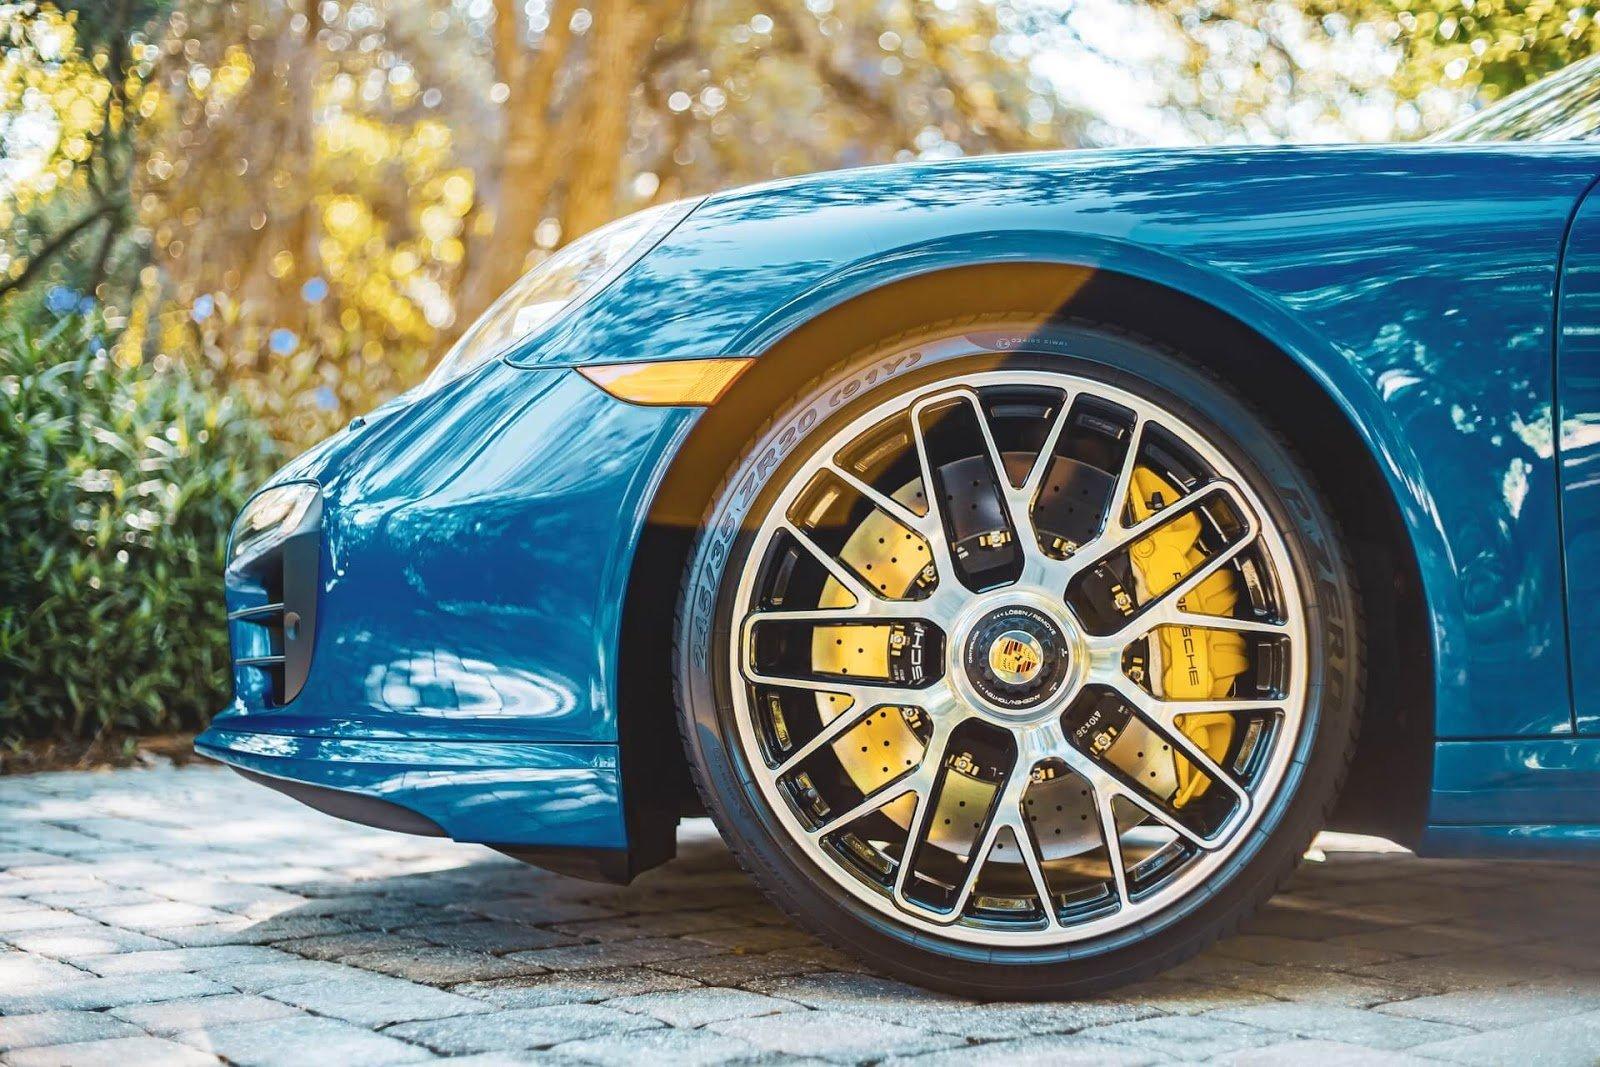 Bullet Proof Tires